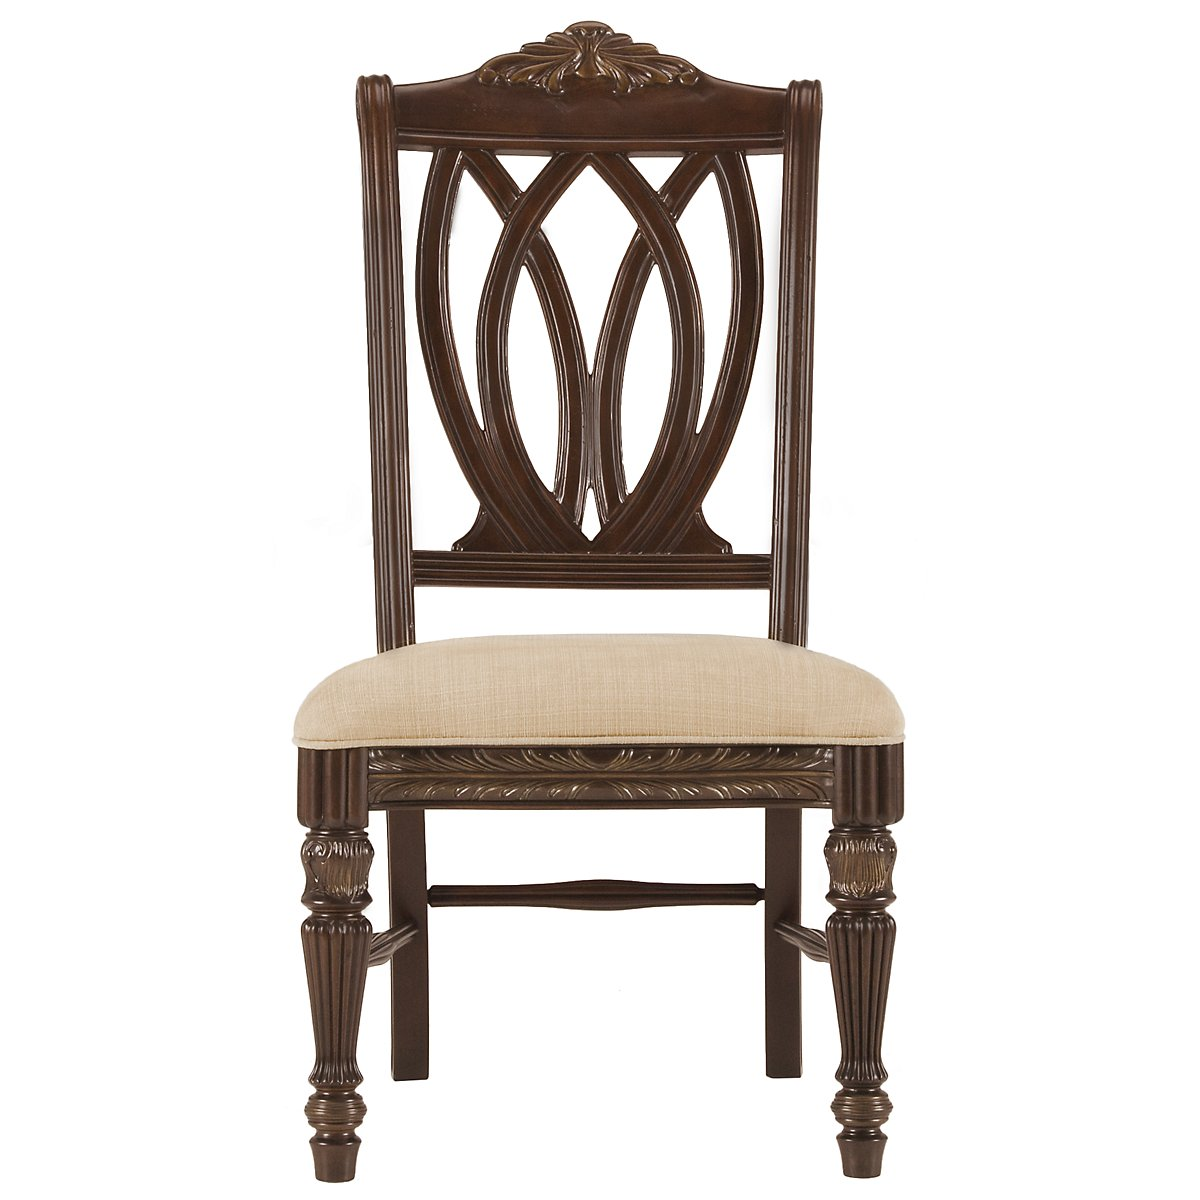 City Furniture Tradewinds Dark Tone Glass Table 4 Wood Chairs